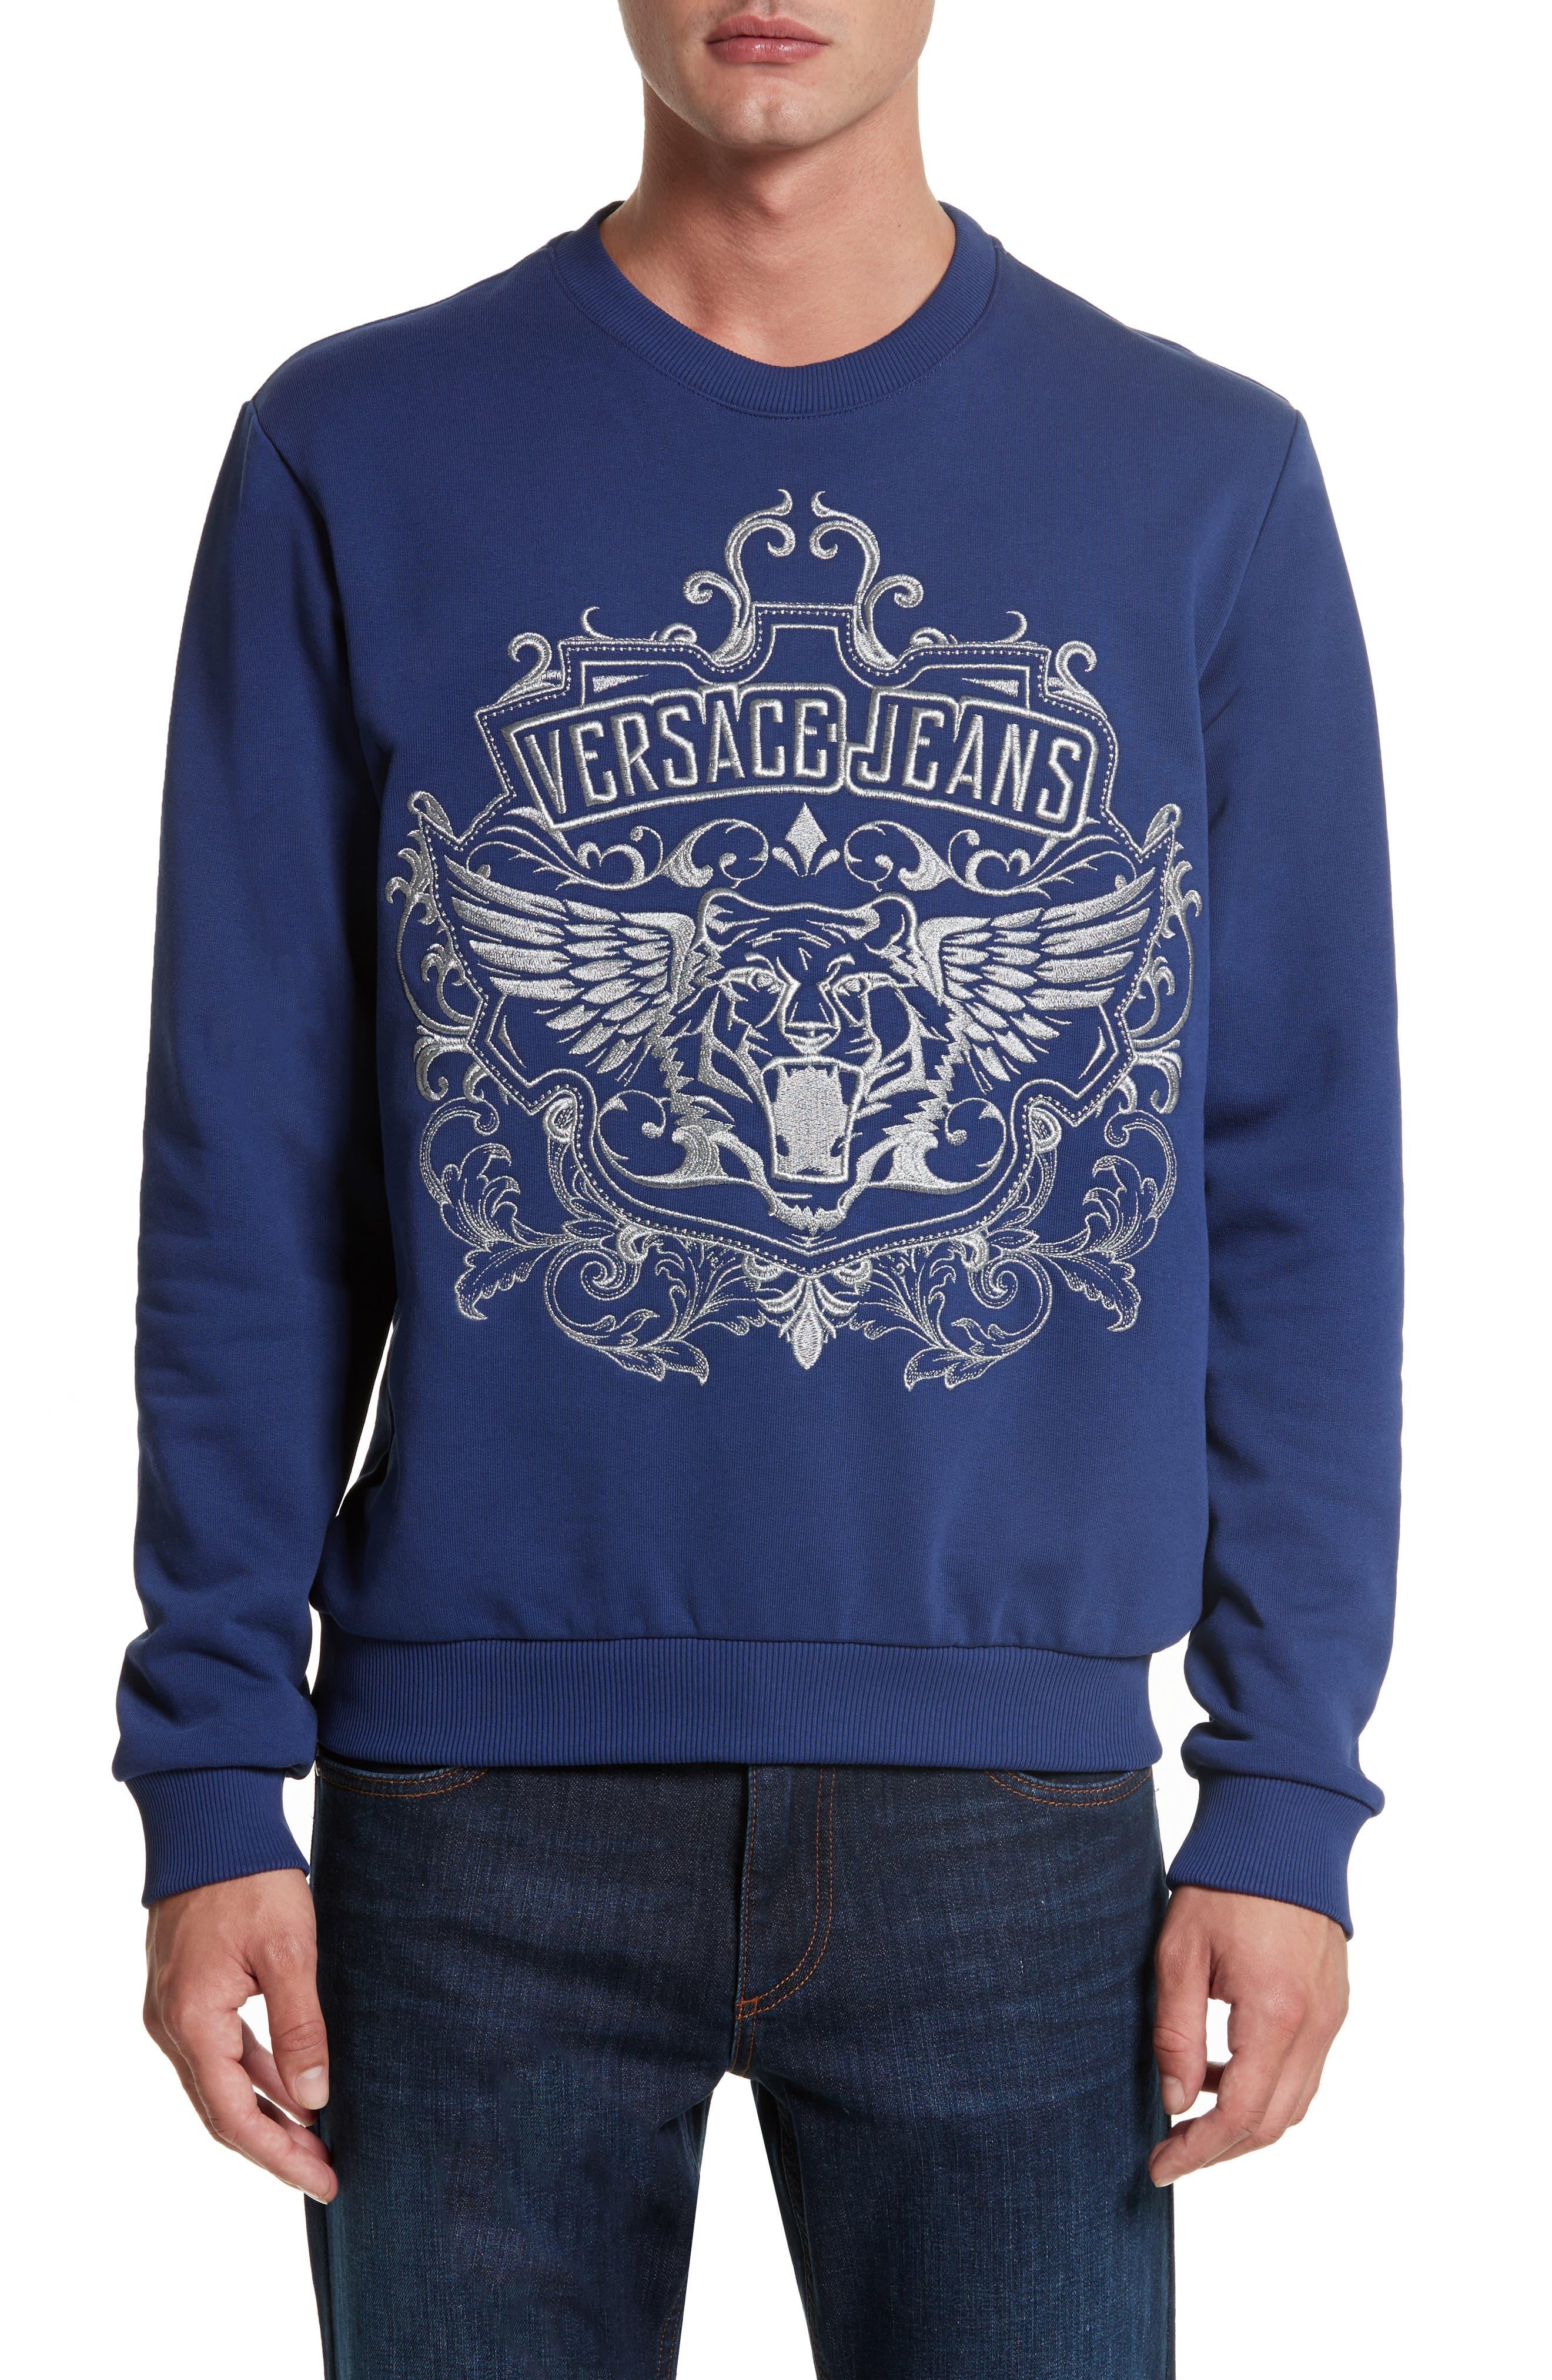 Versace Jeans Embroidered Crewneck Sweatshirt